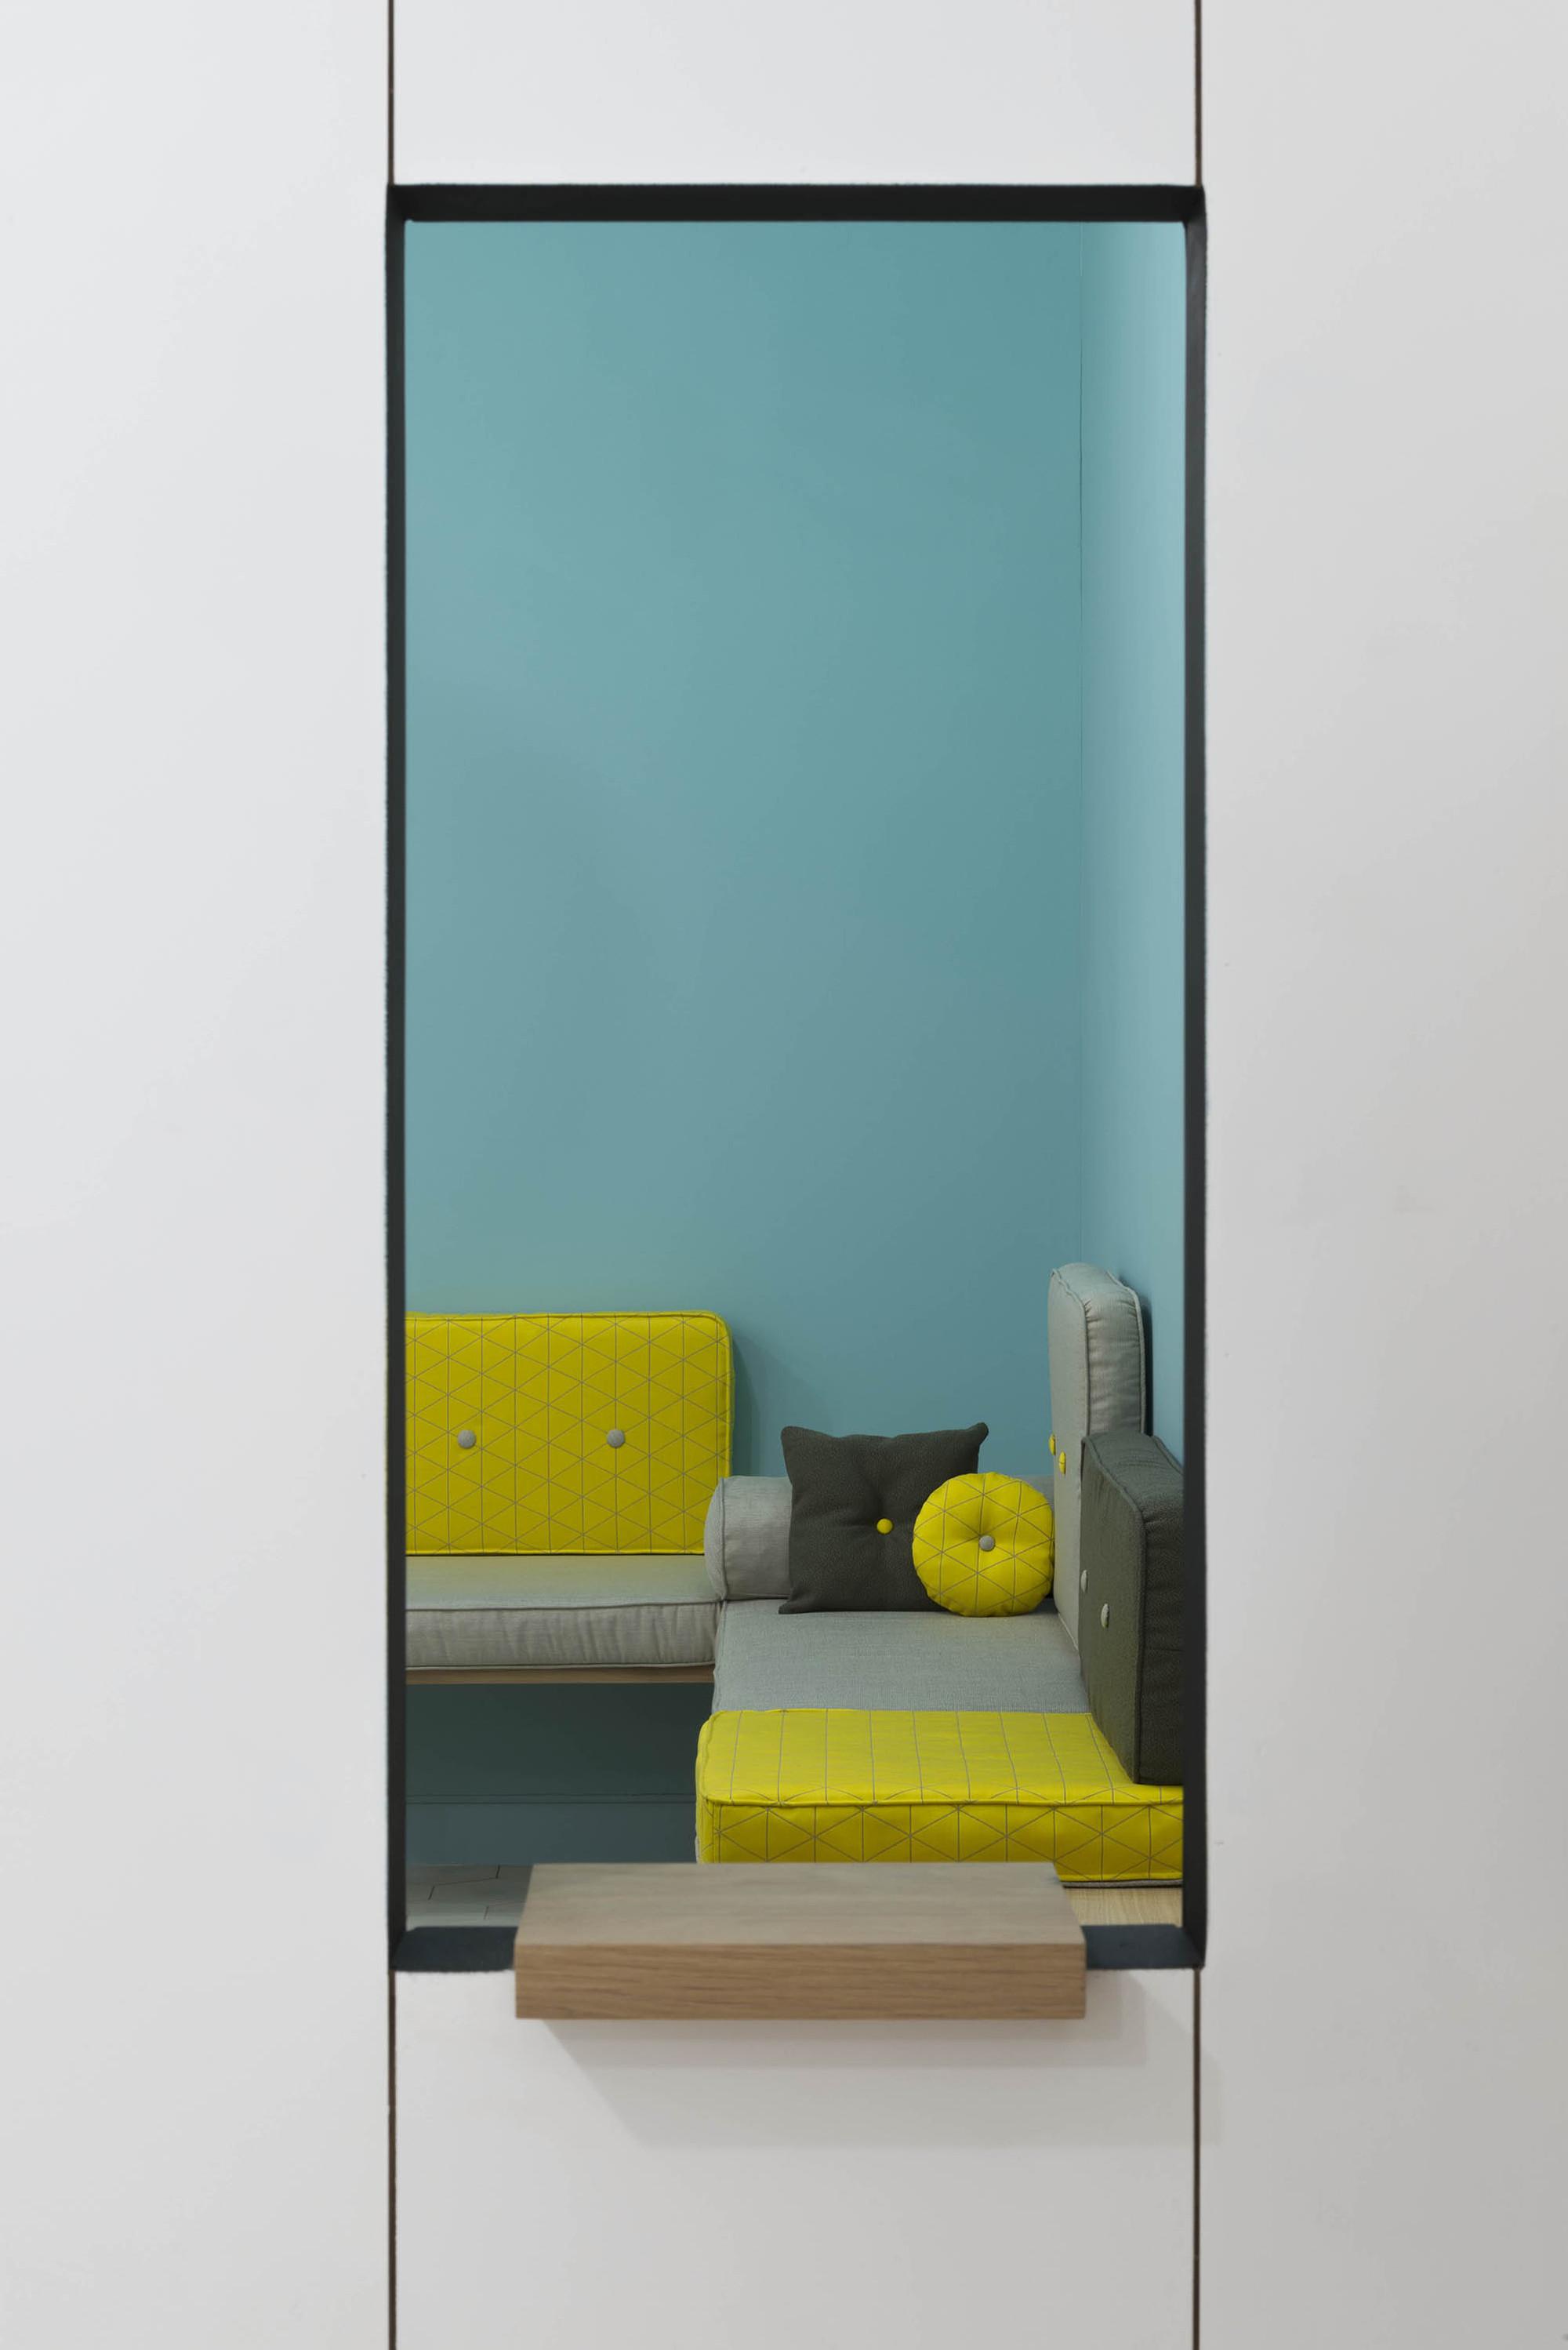 gallery of le coiffeur margaux keller design studio bertrand guillon architecture 2